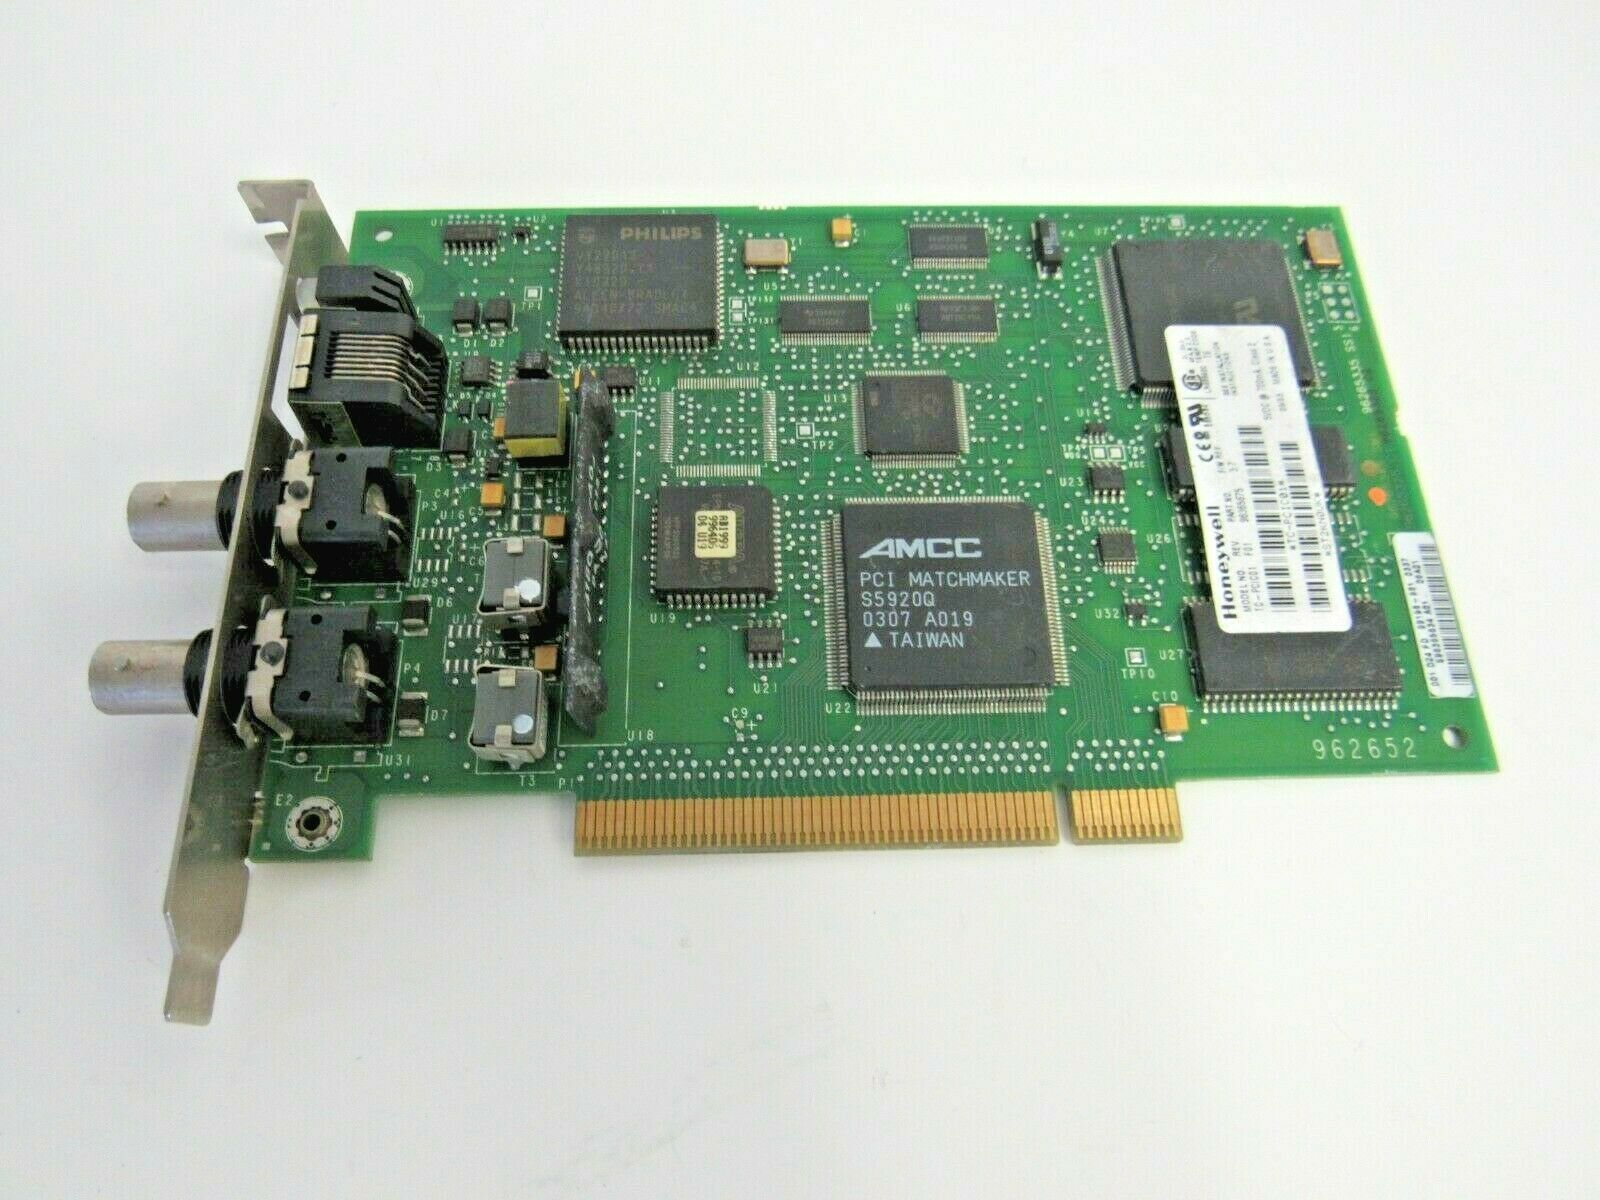 Honeywell TC-PCIC01 REV-F01 FW-3.7 PCI ControlNet Interface Network Card 9-3